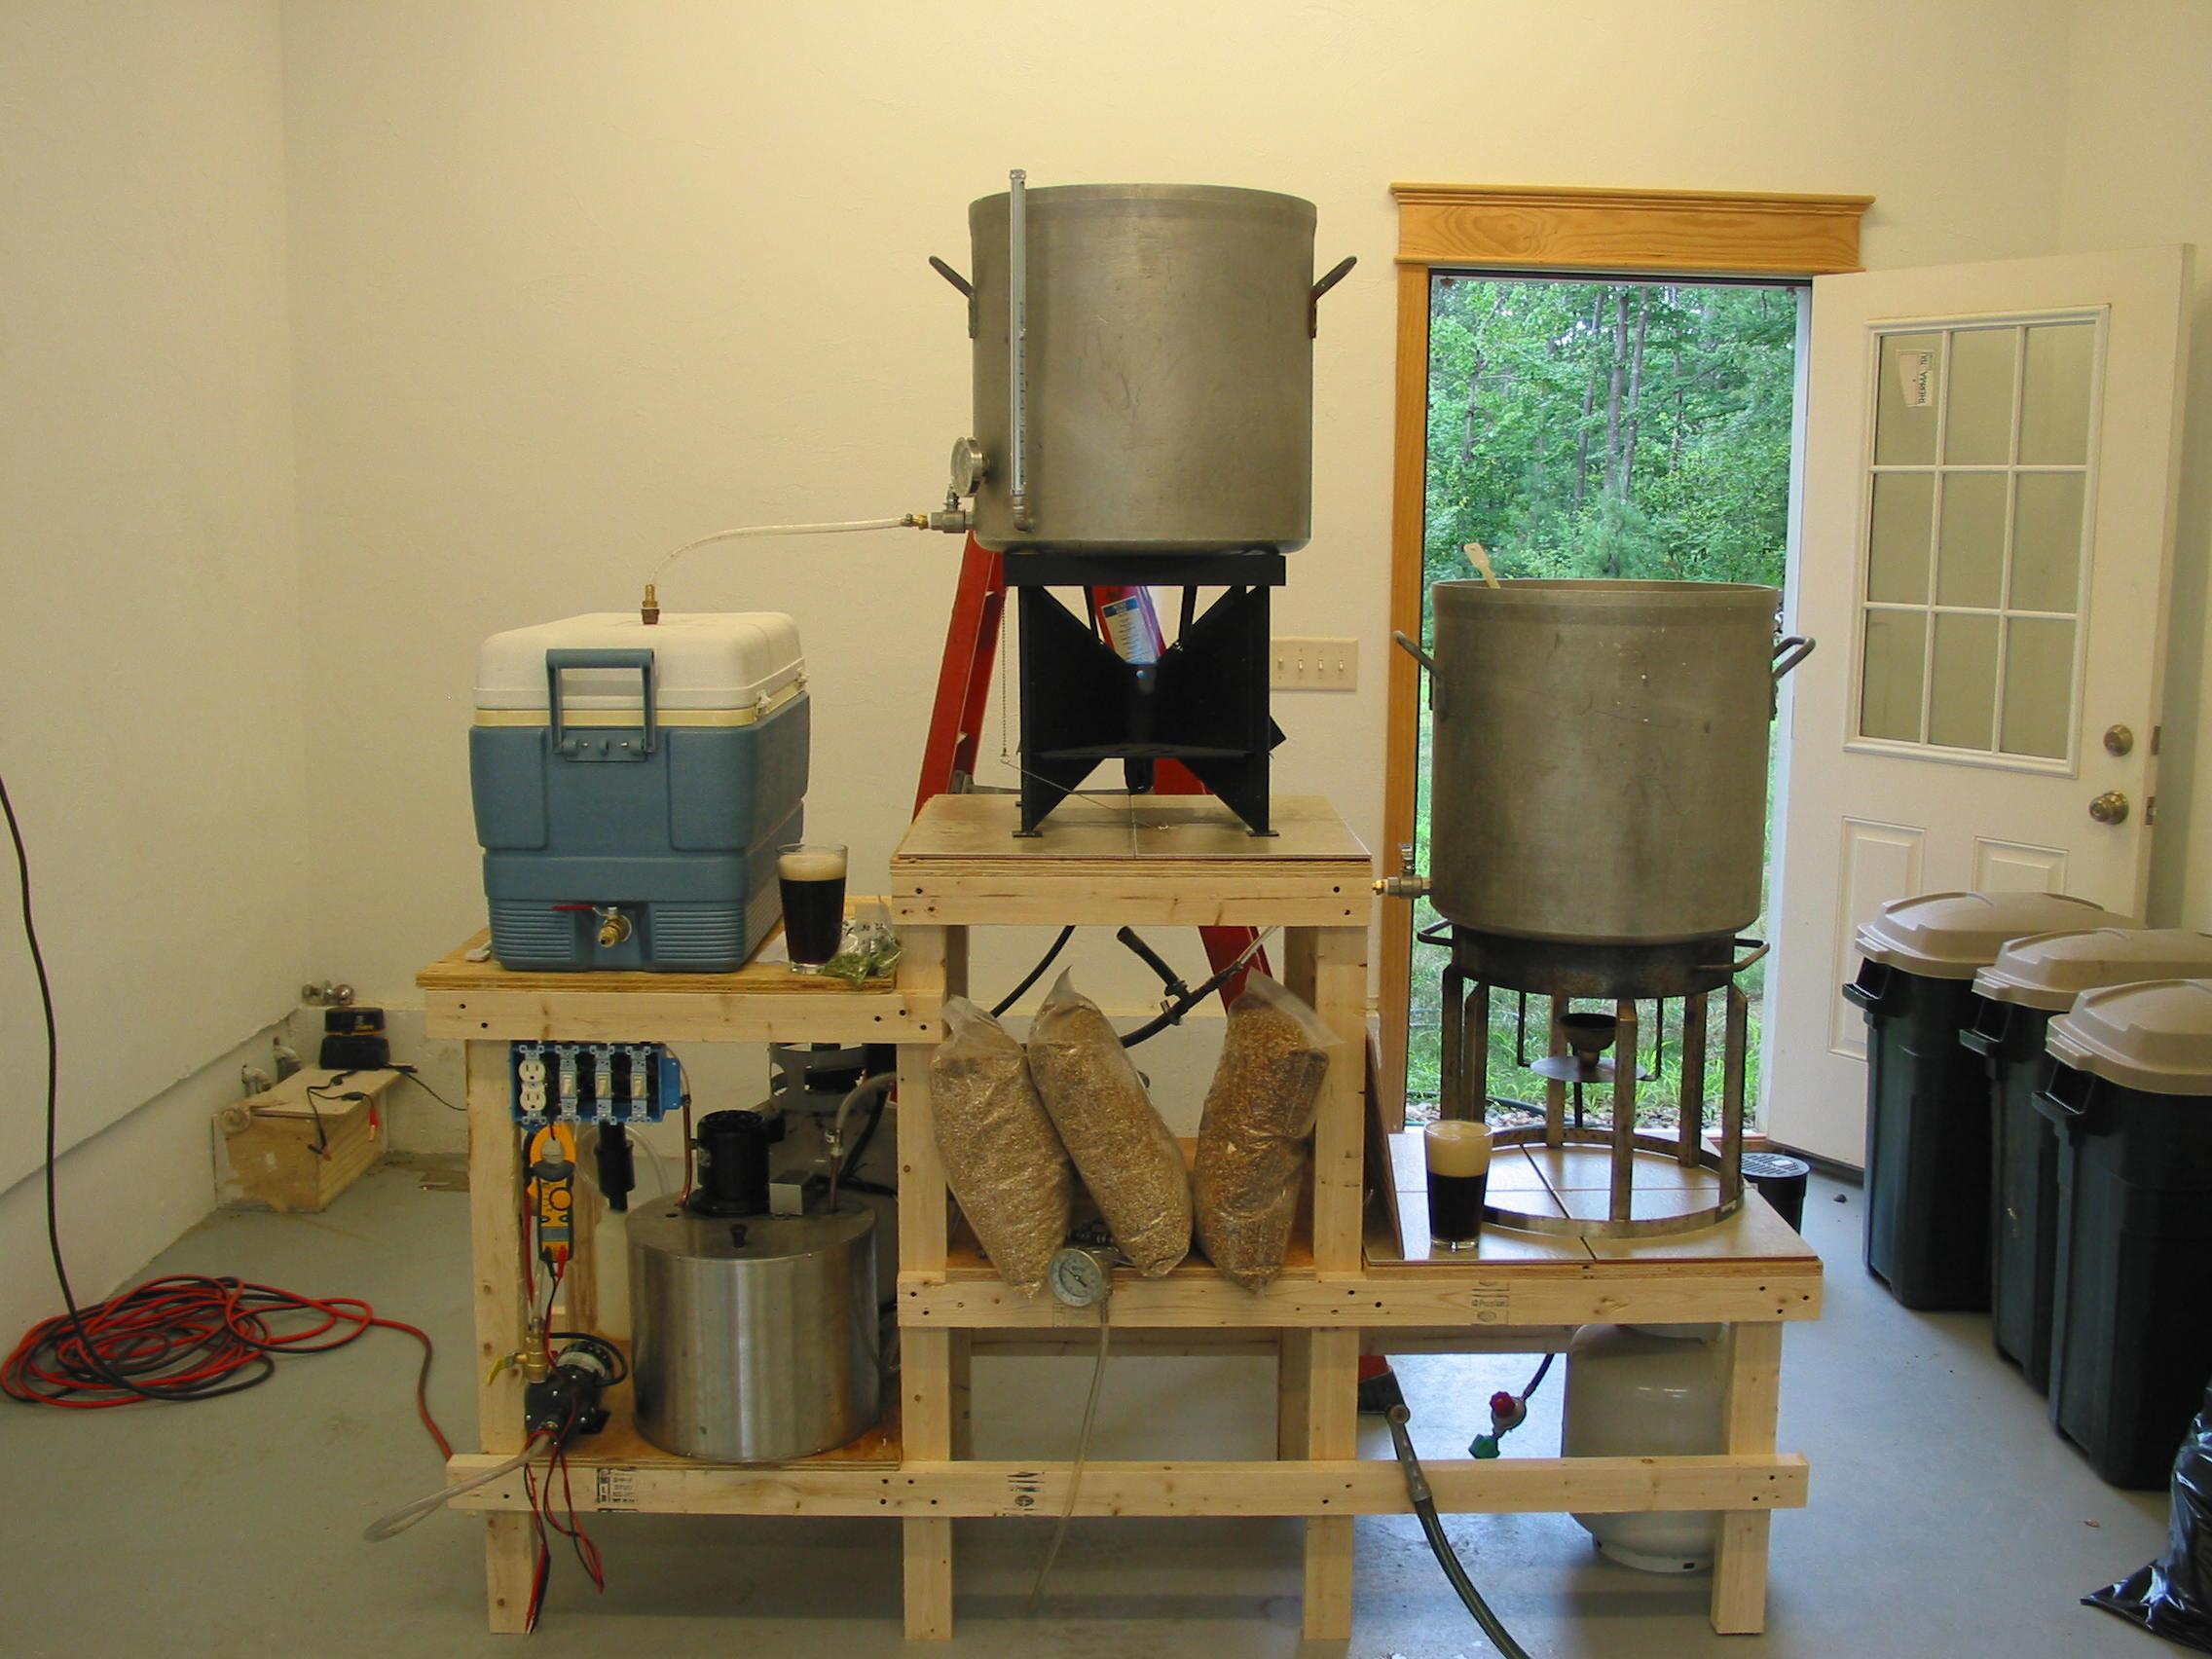 serum visions all grain brewing brainstorm brewery